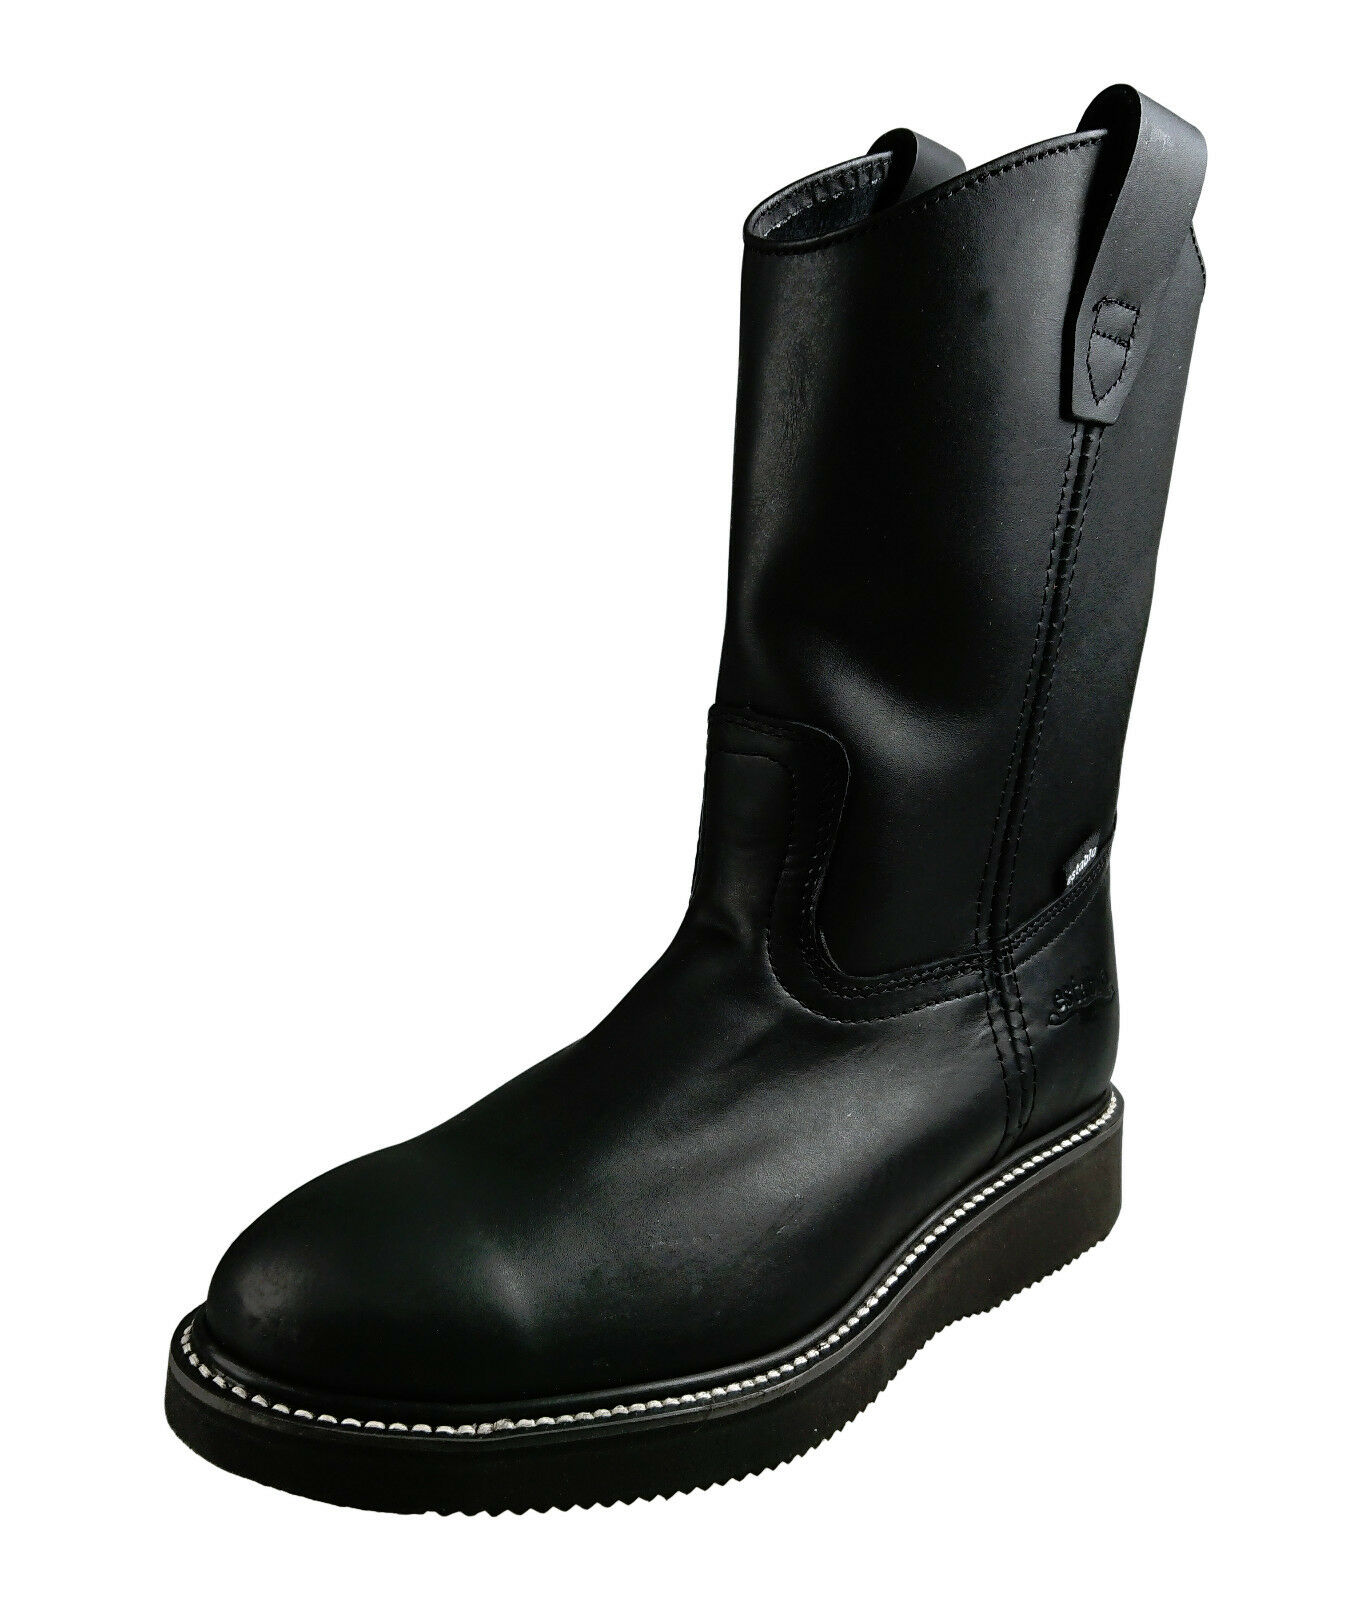 Men's Genuine Leather Work Boots Pull On Establo Western Cowboy Style 553 Black